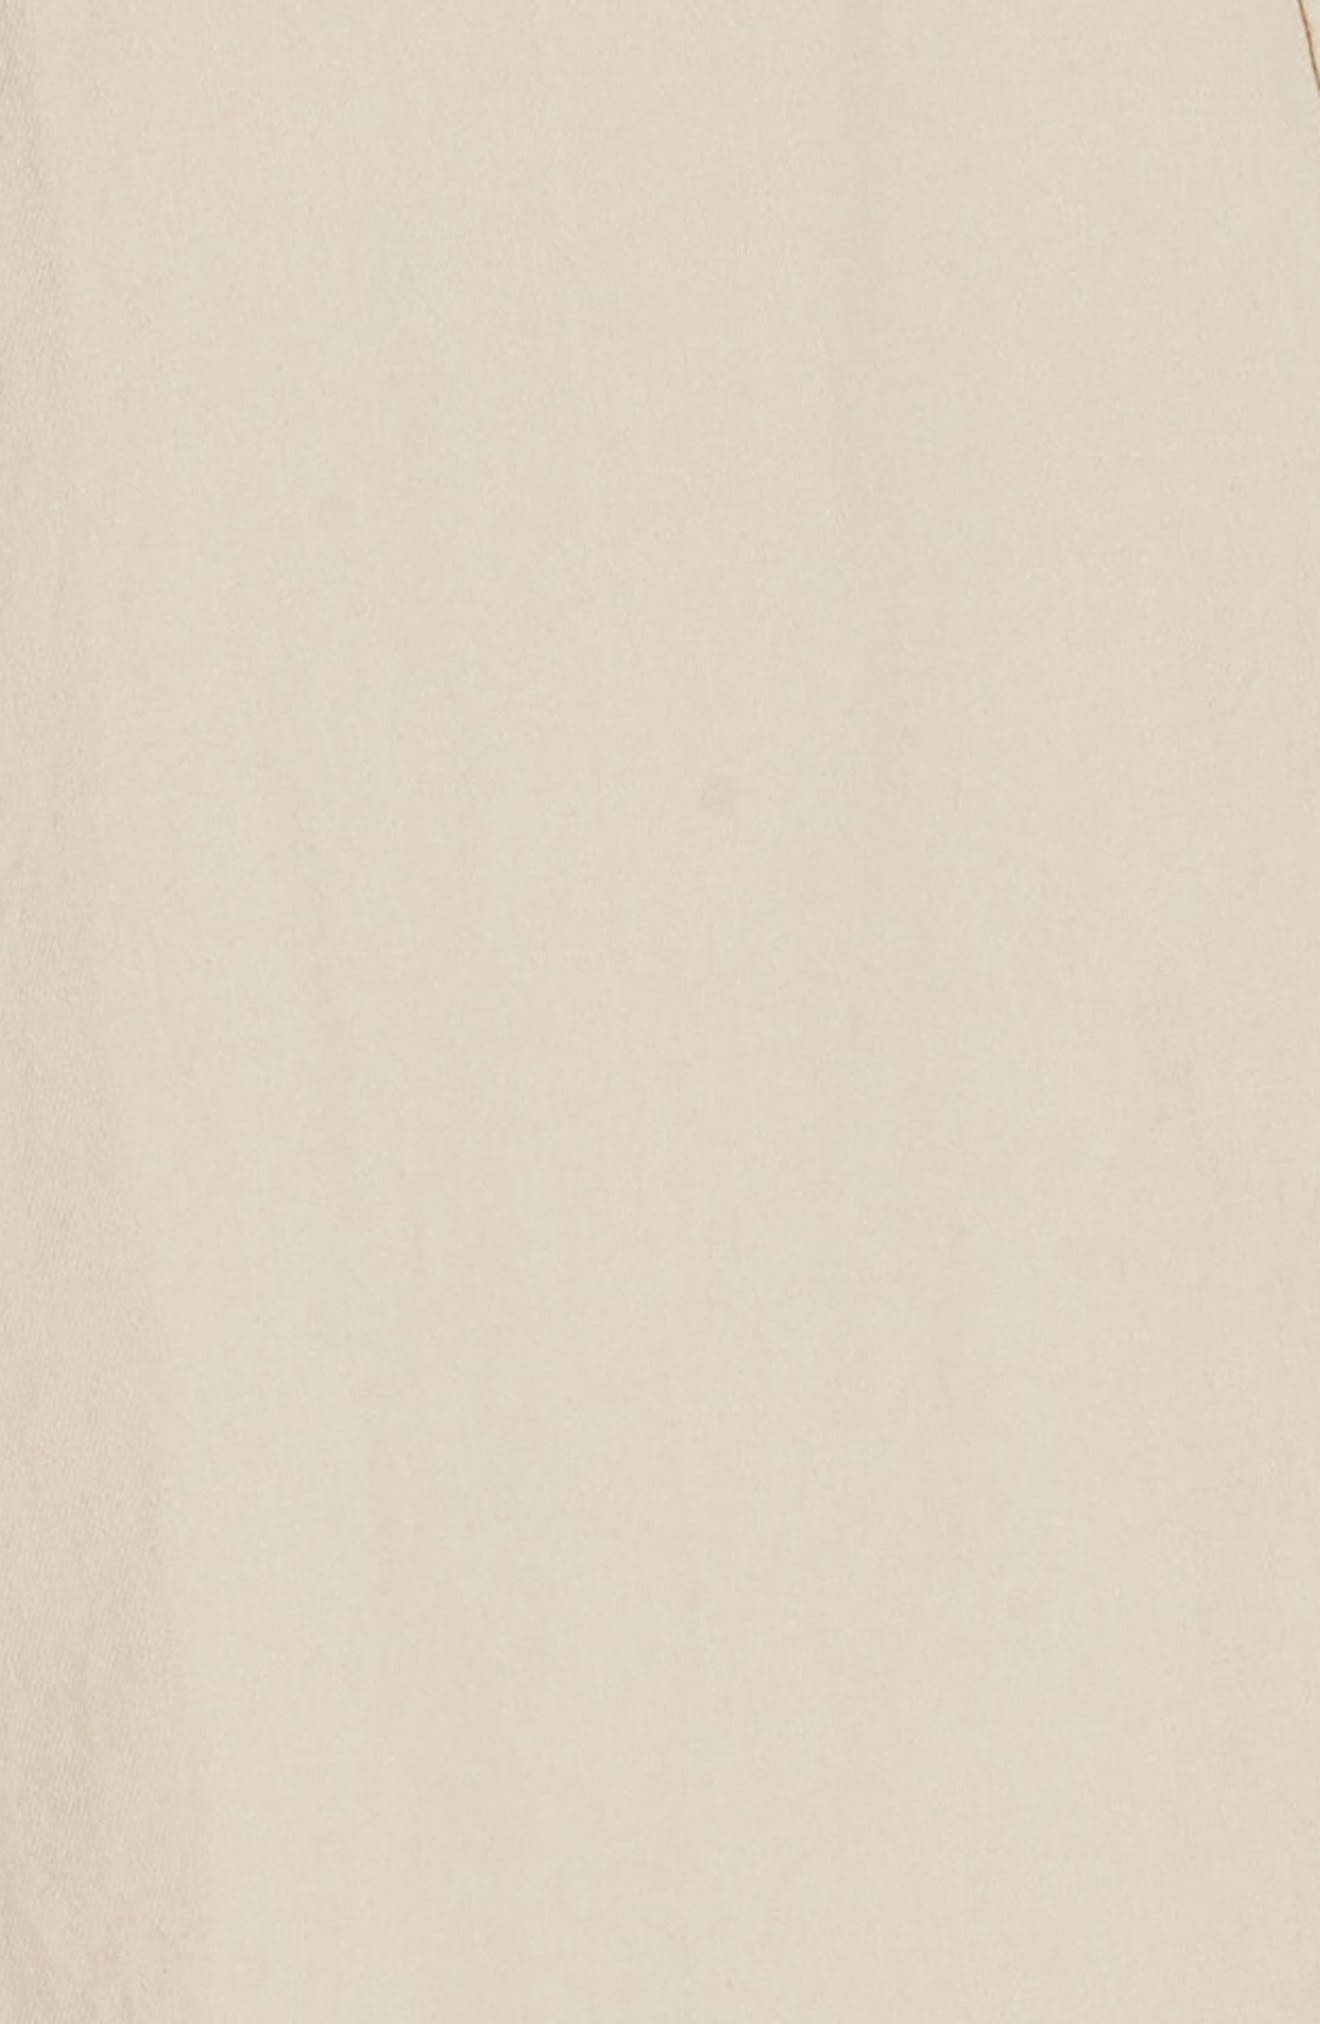 Briel Midi Dress,                             Alternate thumbnail 5, color,                             Light Sand